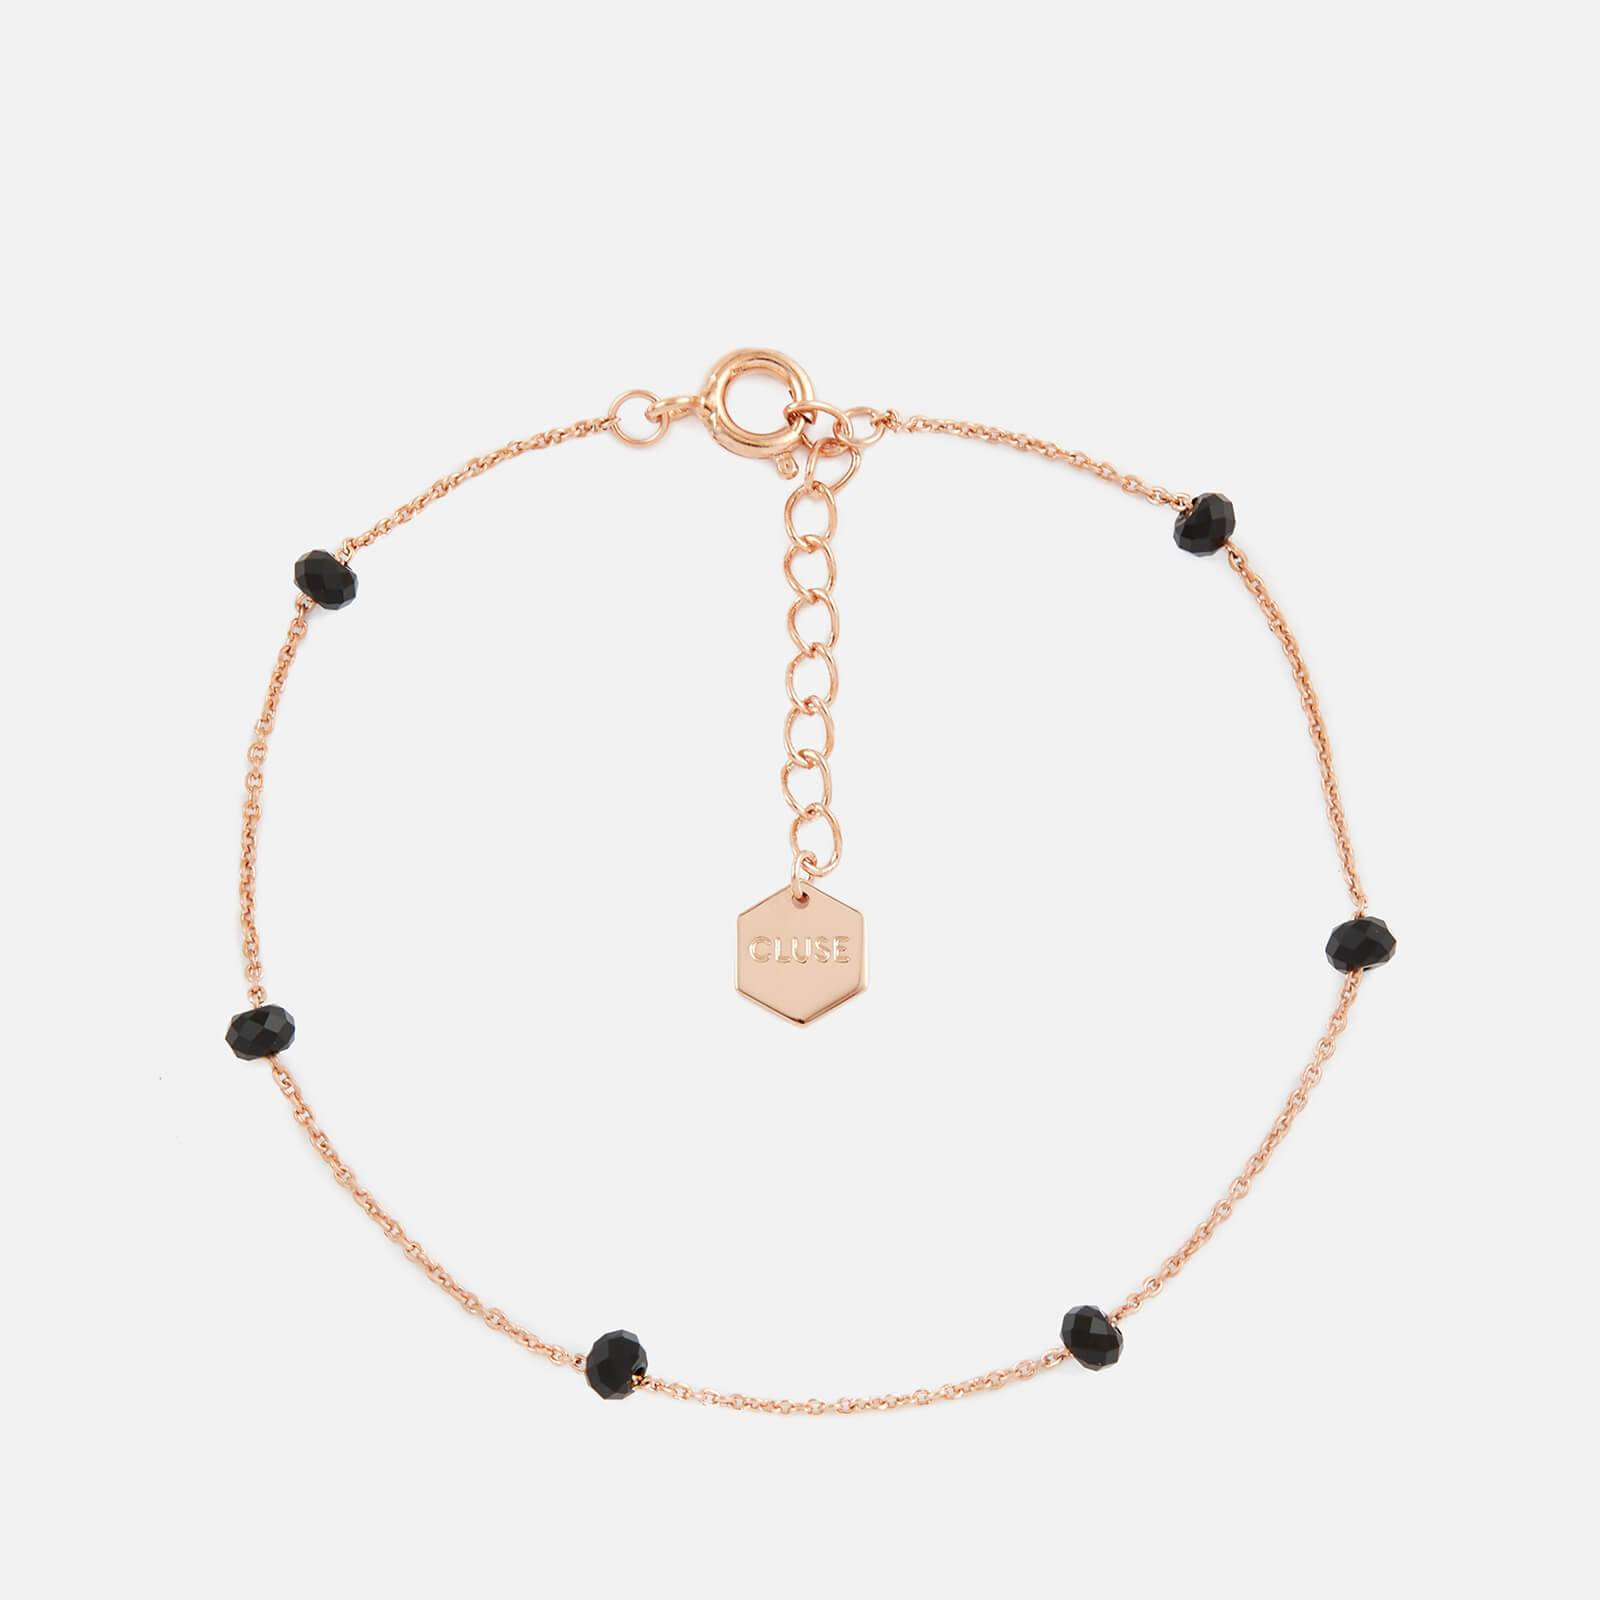 Cluse Women's Essentielle Black Crystals Chain Bracelet - Rose Gold